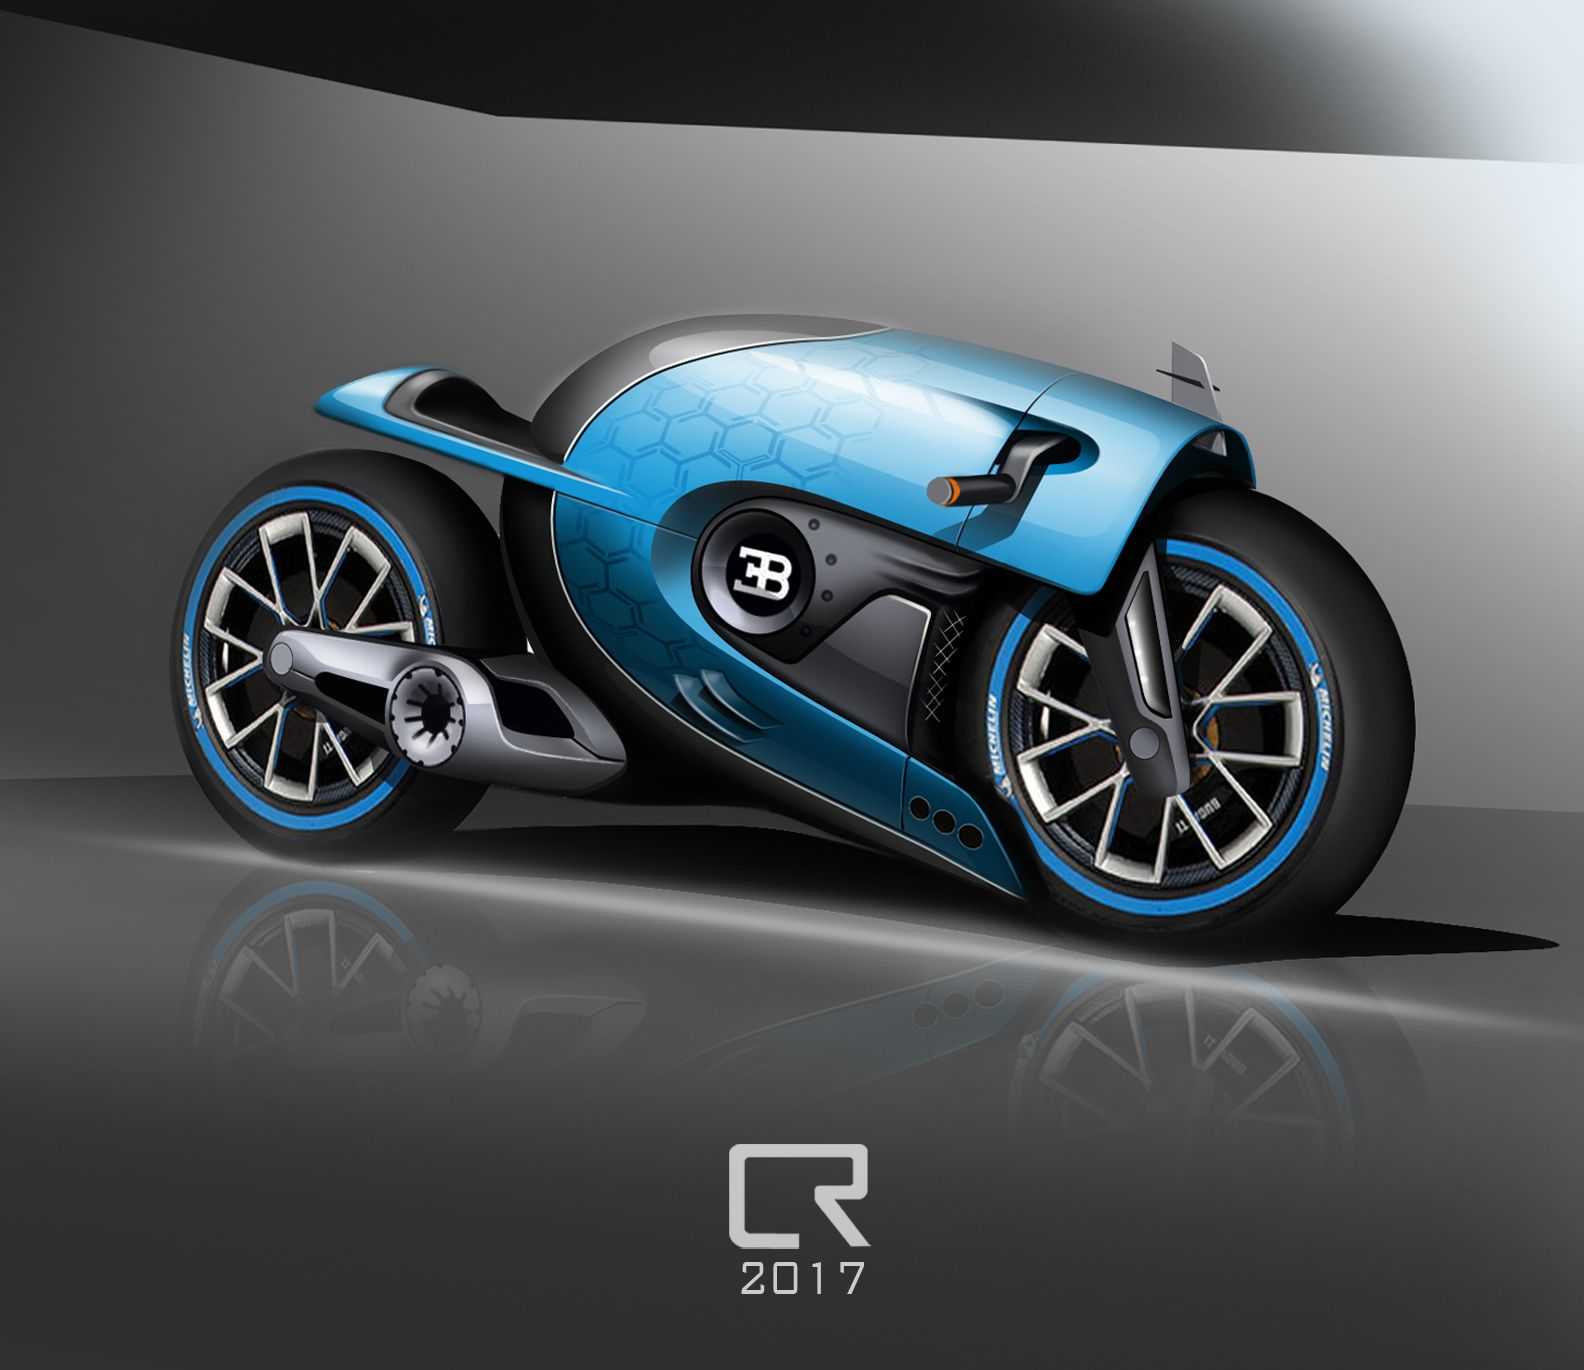 Bugatticonceptbikechallenge Concept Bike Challenge With Images